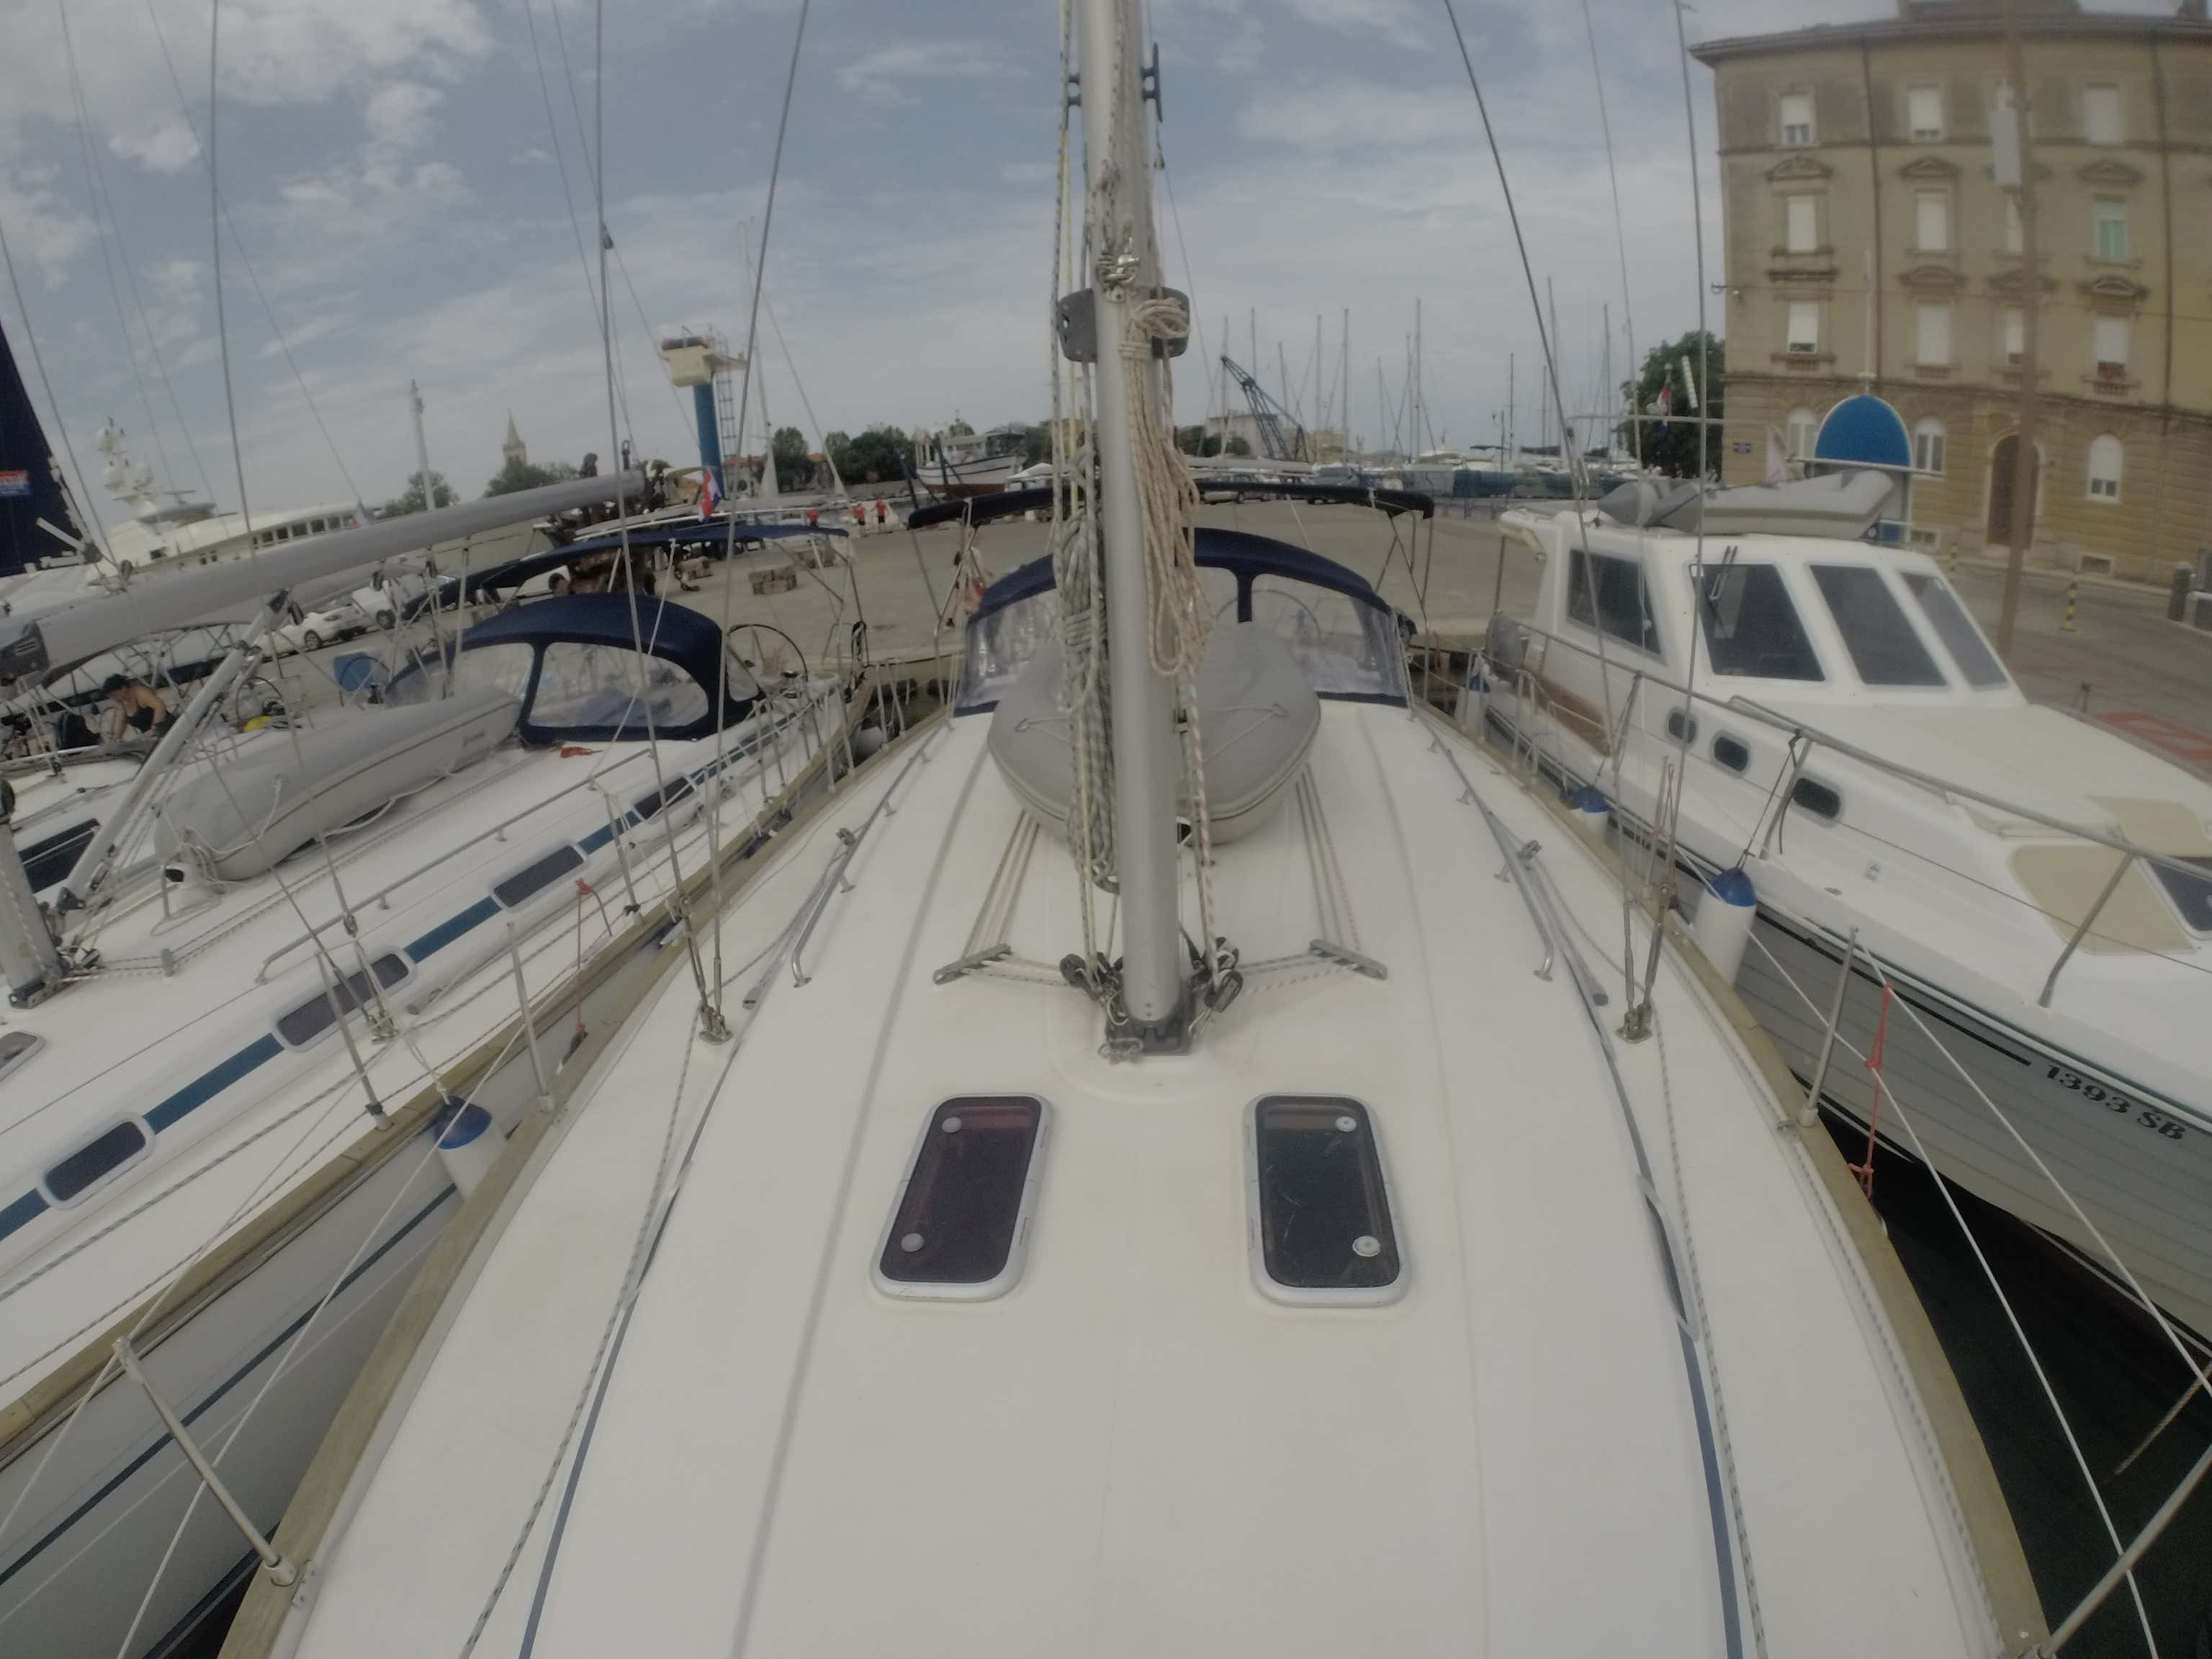 Bavaria 44 (Dišpet - sails 2019/solar panels)  - 29